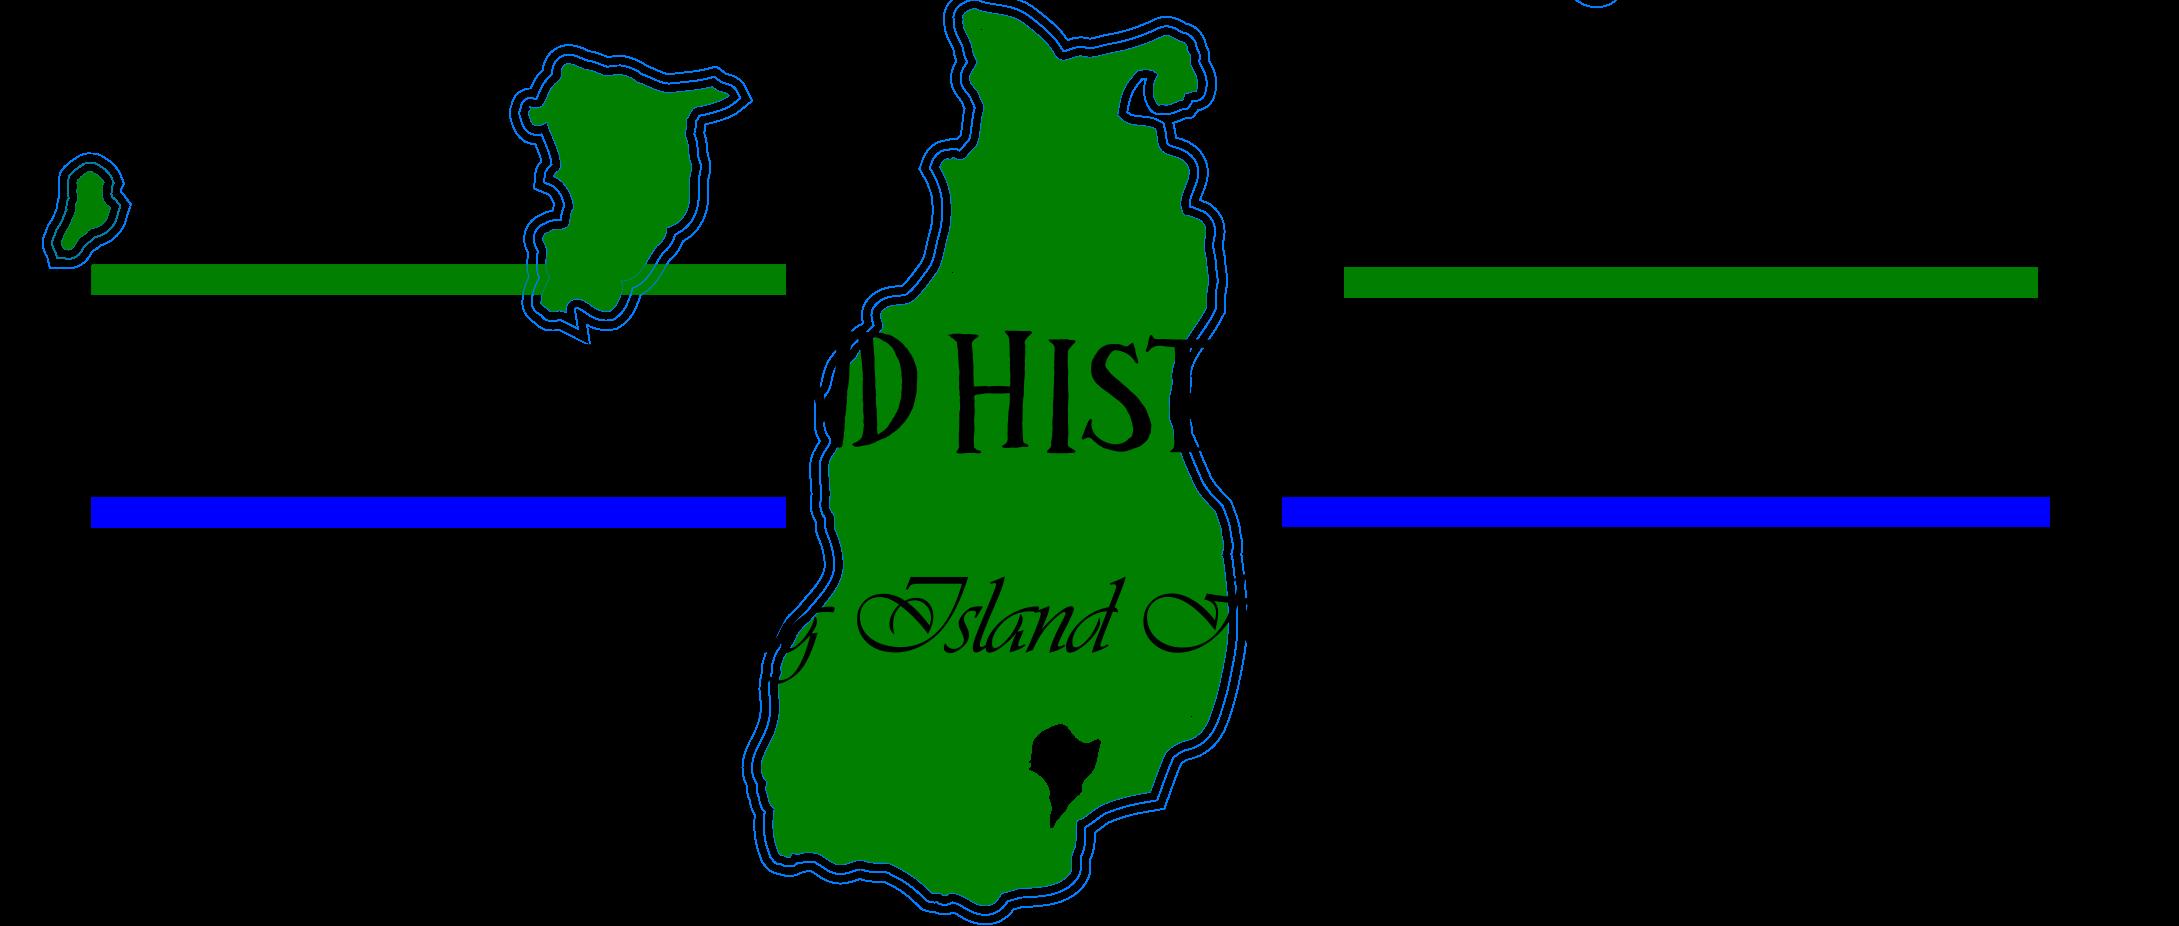 Beaver Island Historical Society Final Logo Final (2020_10_06 17_52_54 UTC)